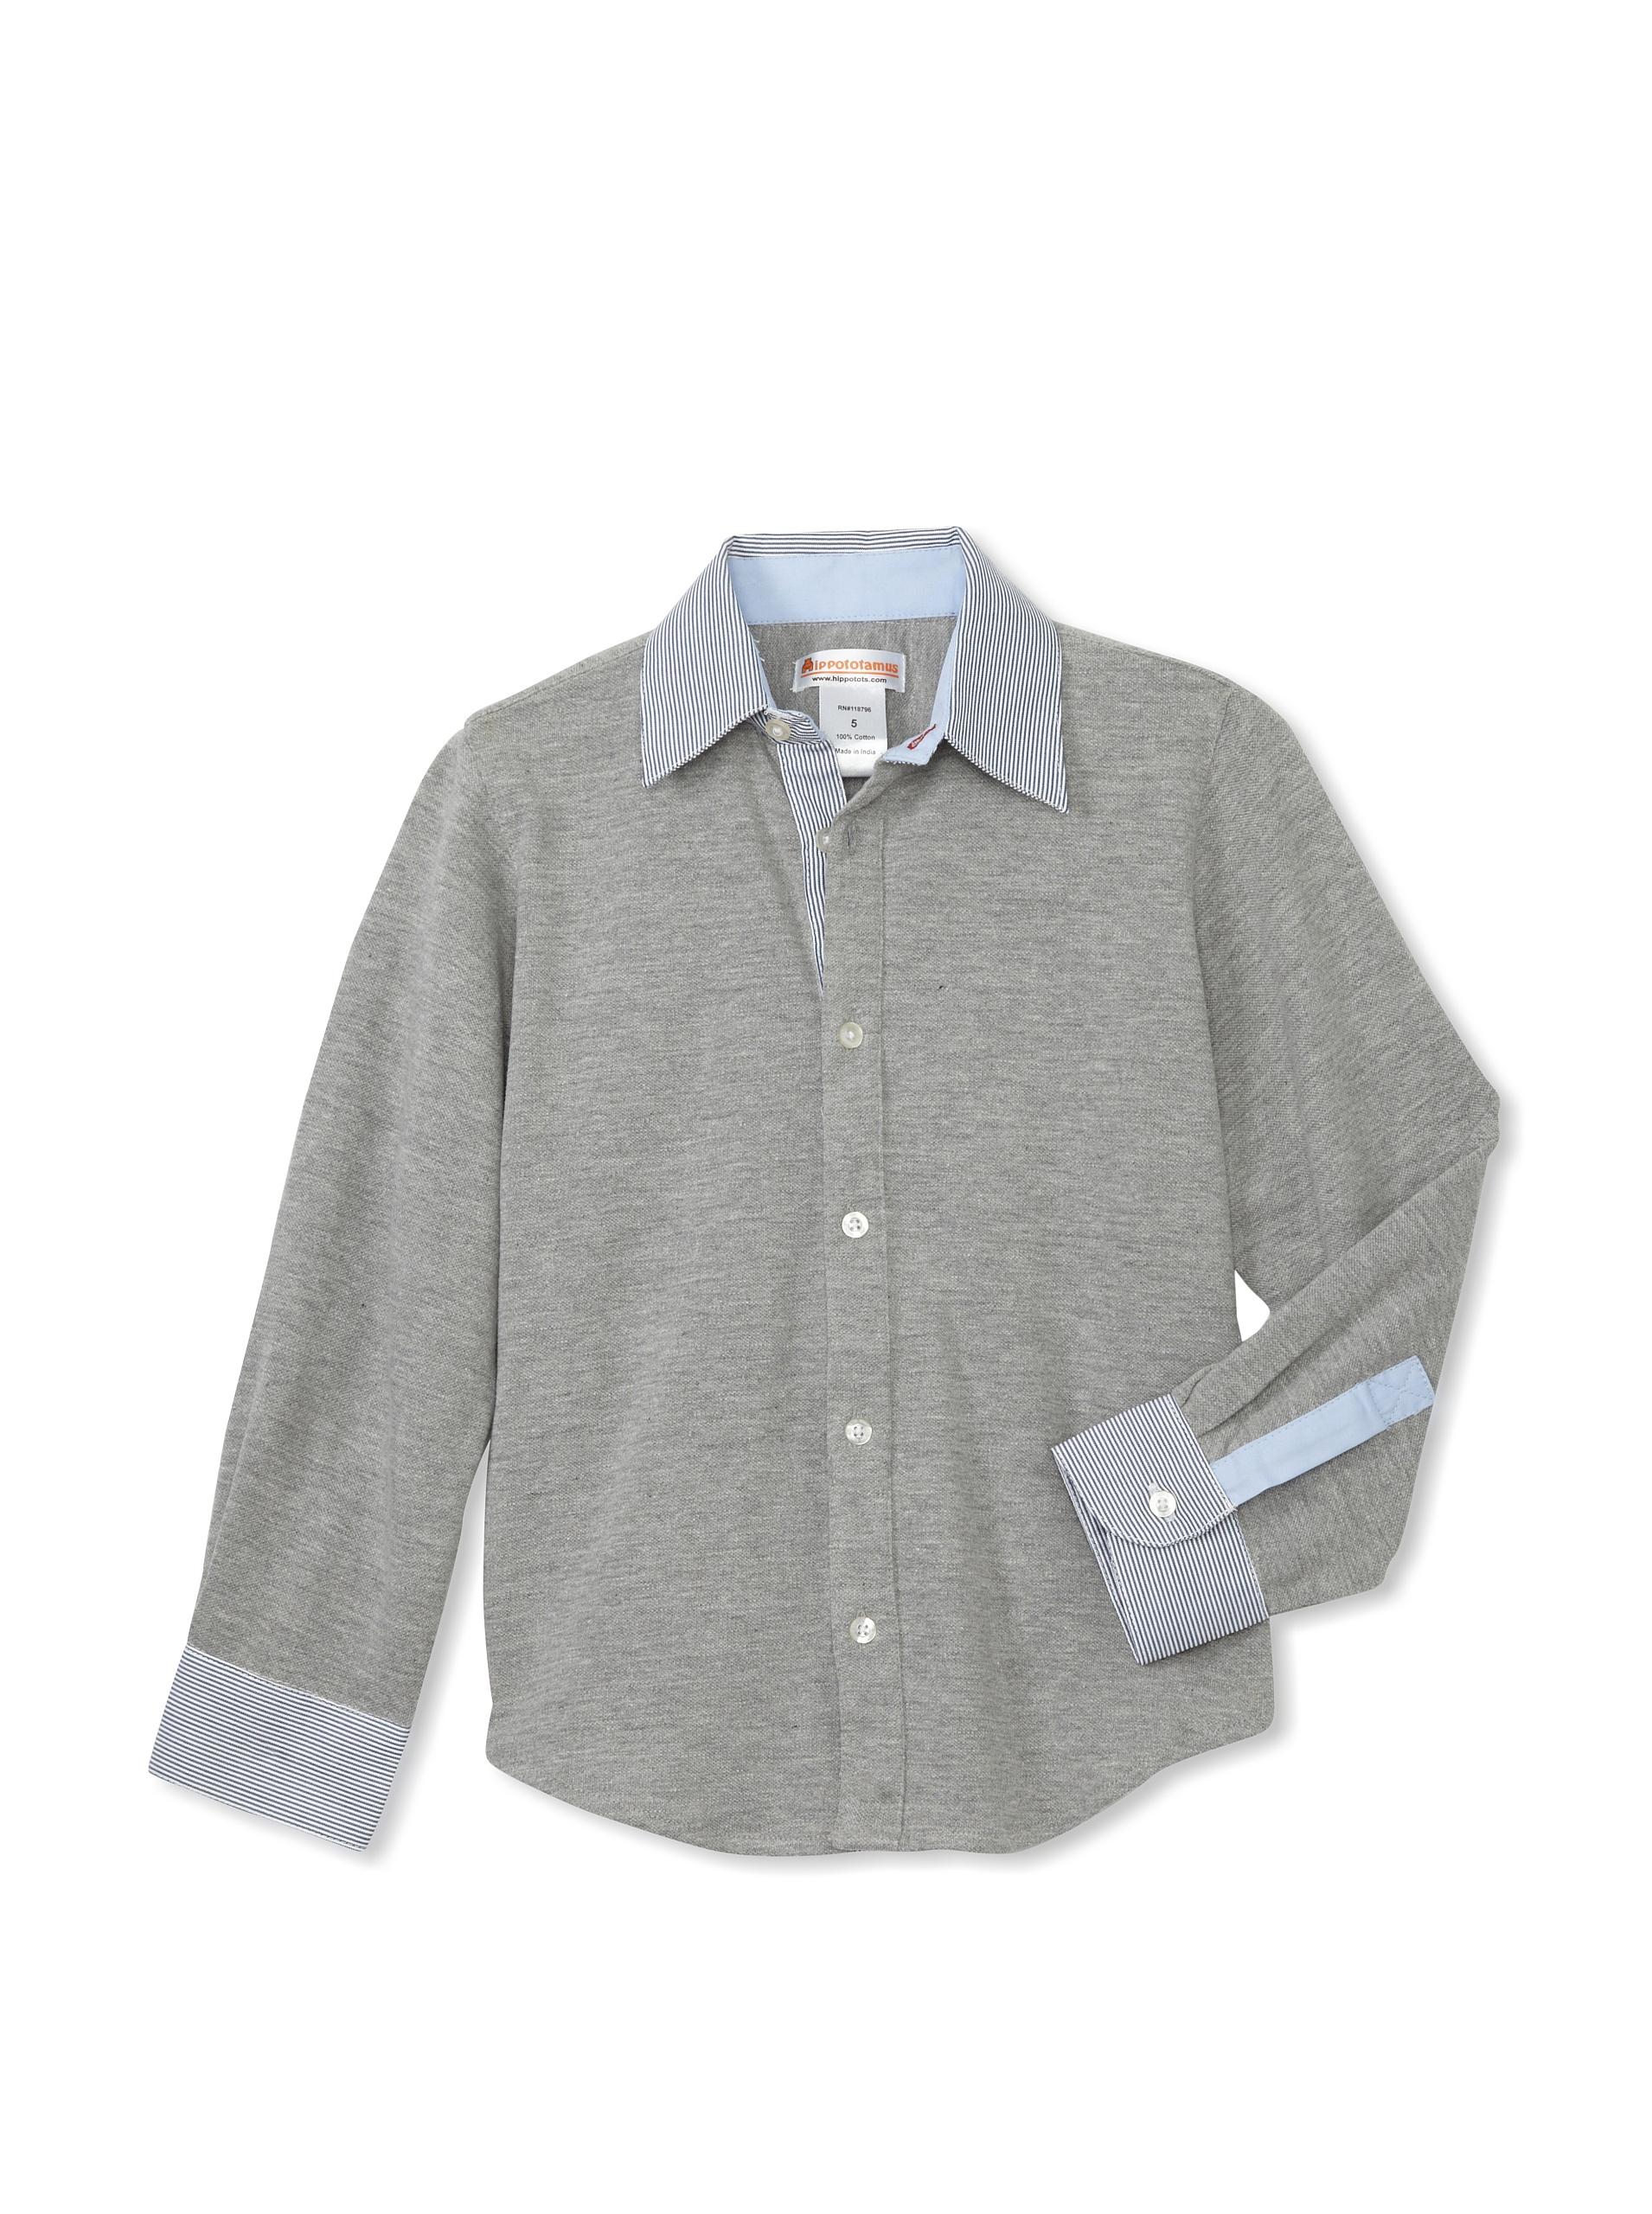 Hippototamus Pique Button-Front Shirt (Grey Pique/Blue Back)